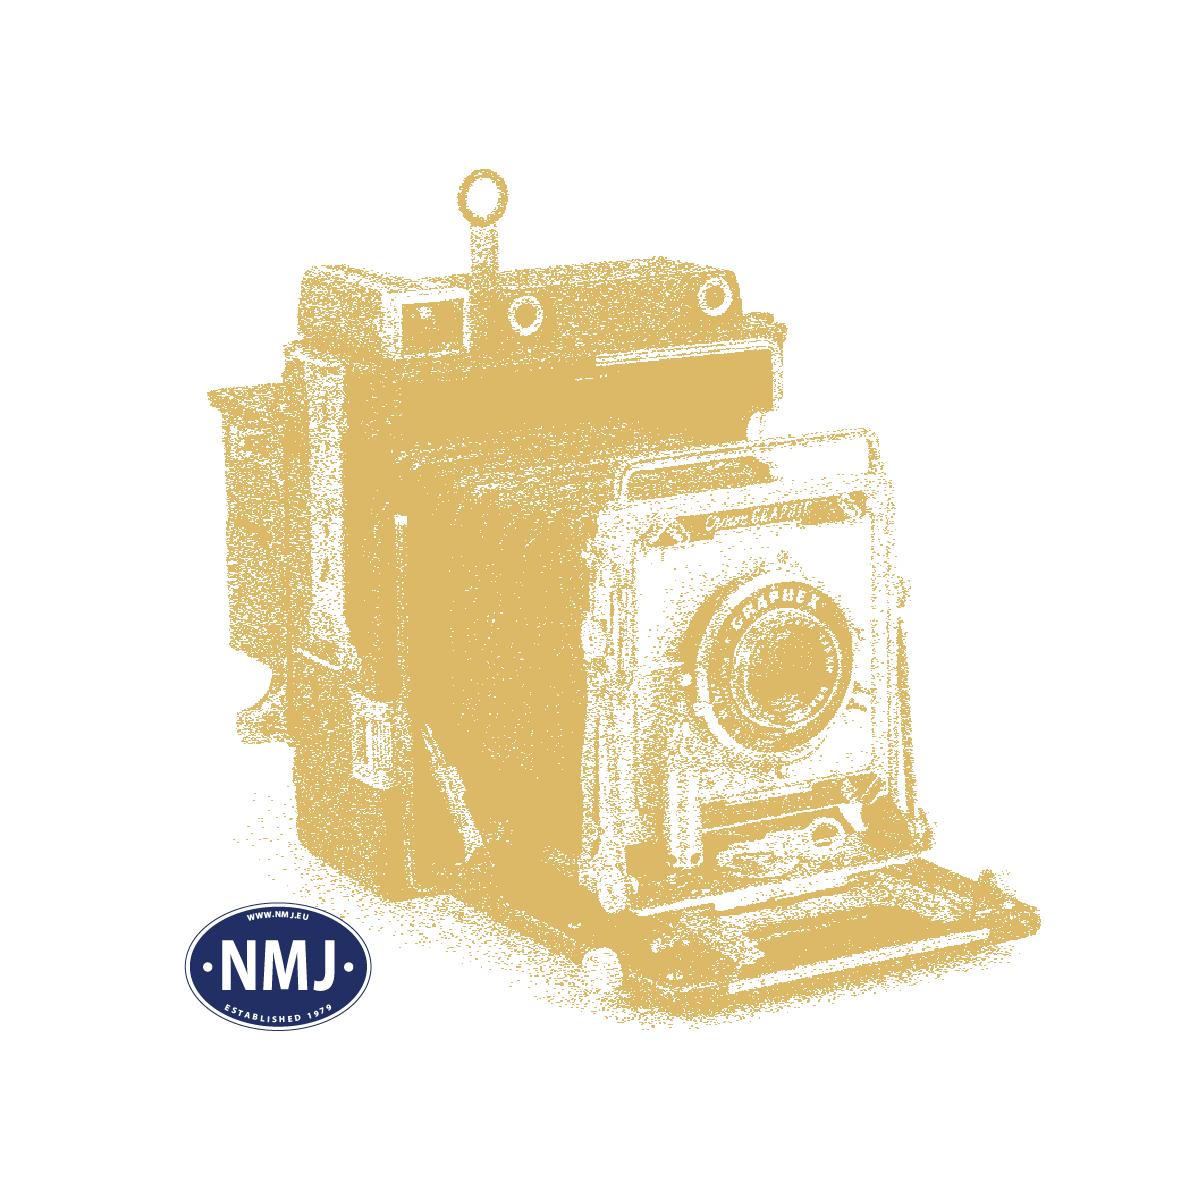 MWB-M013 - Gressmatte, Rough Medow, Vinter #2, 30 x 21 Cm